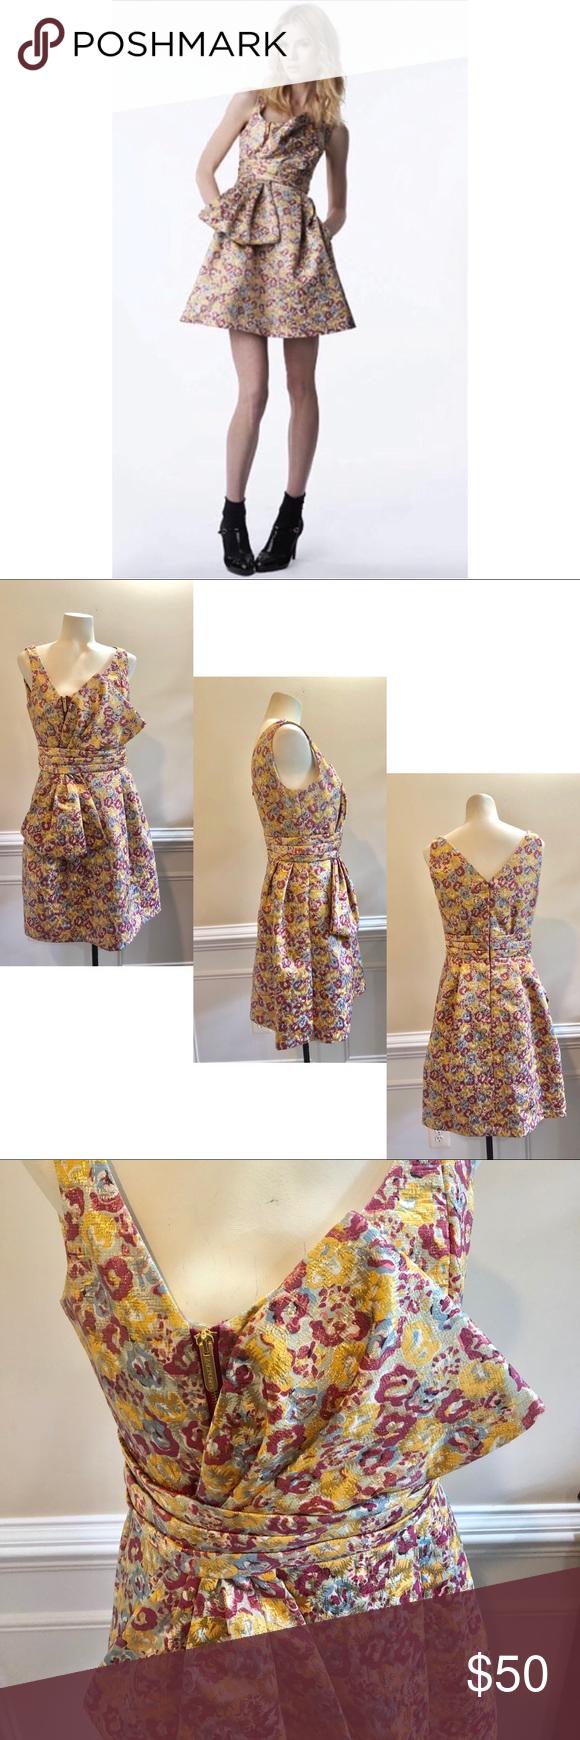 Zac Posen For Target Brocade Tie Mini Dress Zac Posen Mini Dress Mini Cocktail Dress [ 1740 x 580 Pixel ]